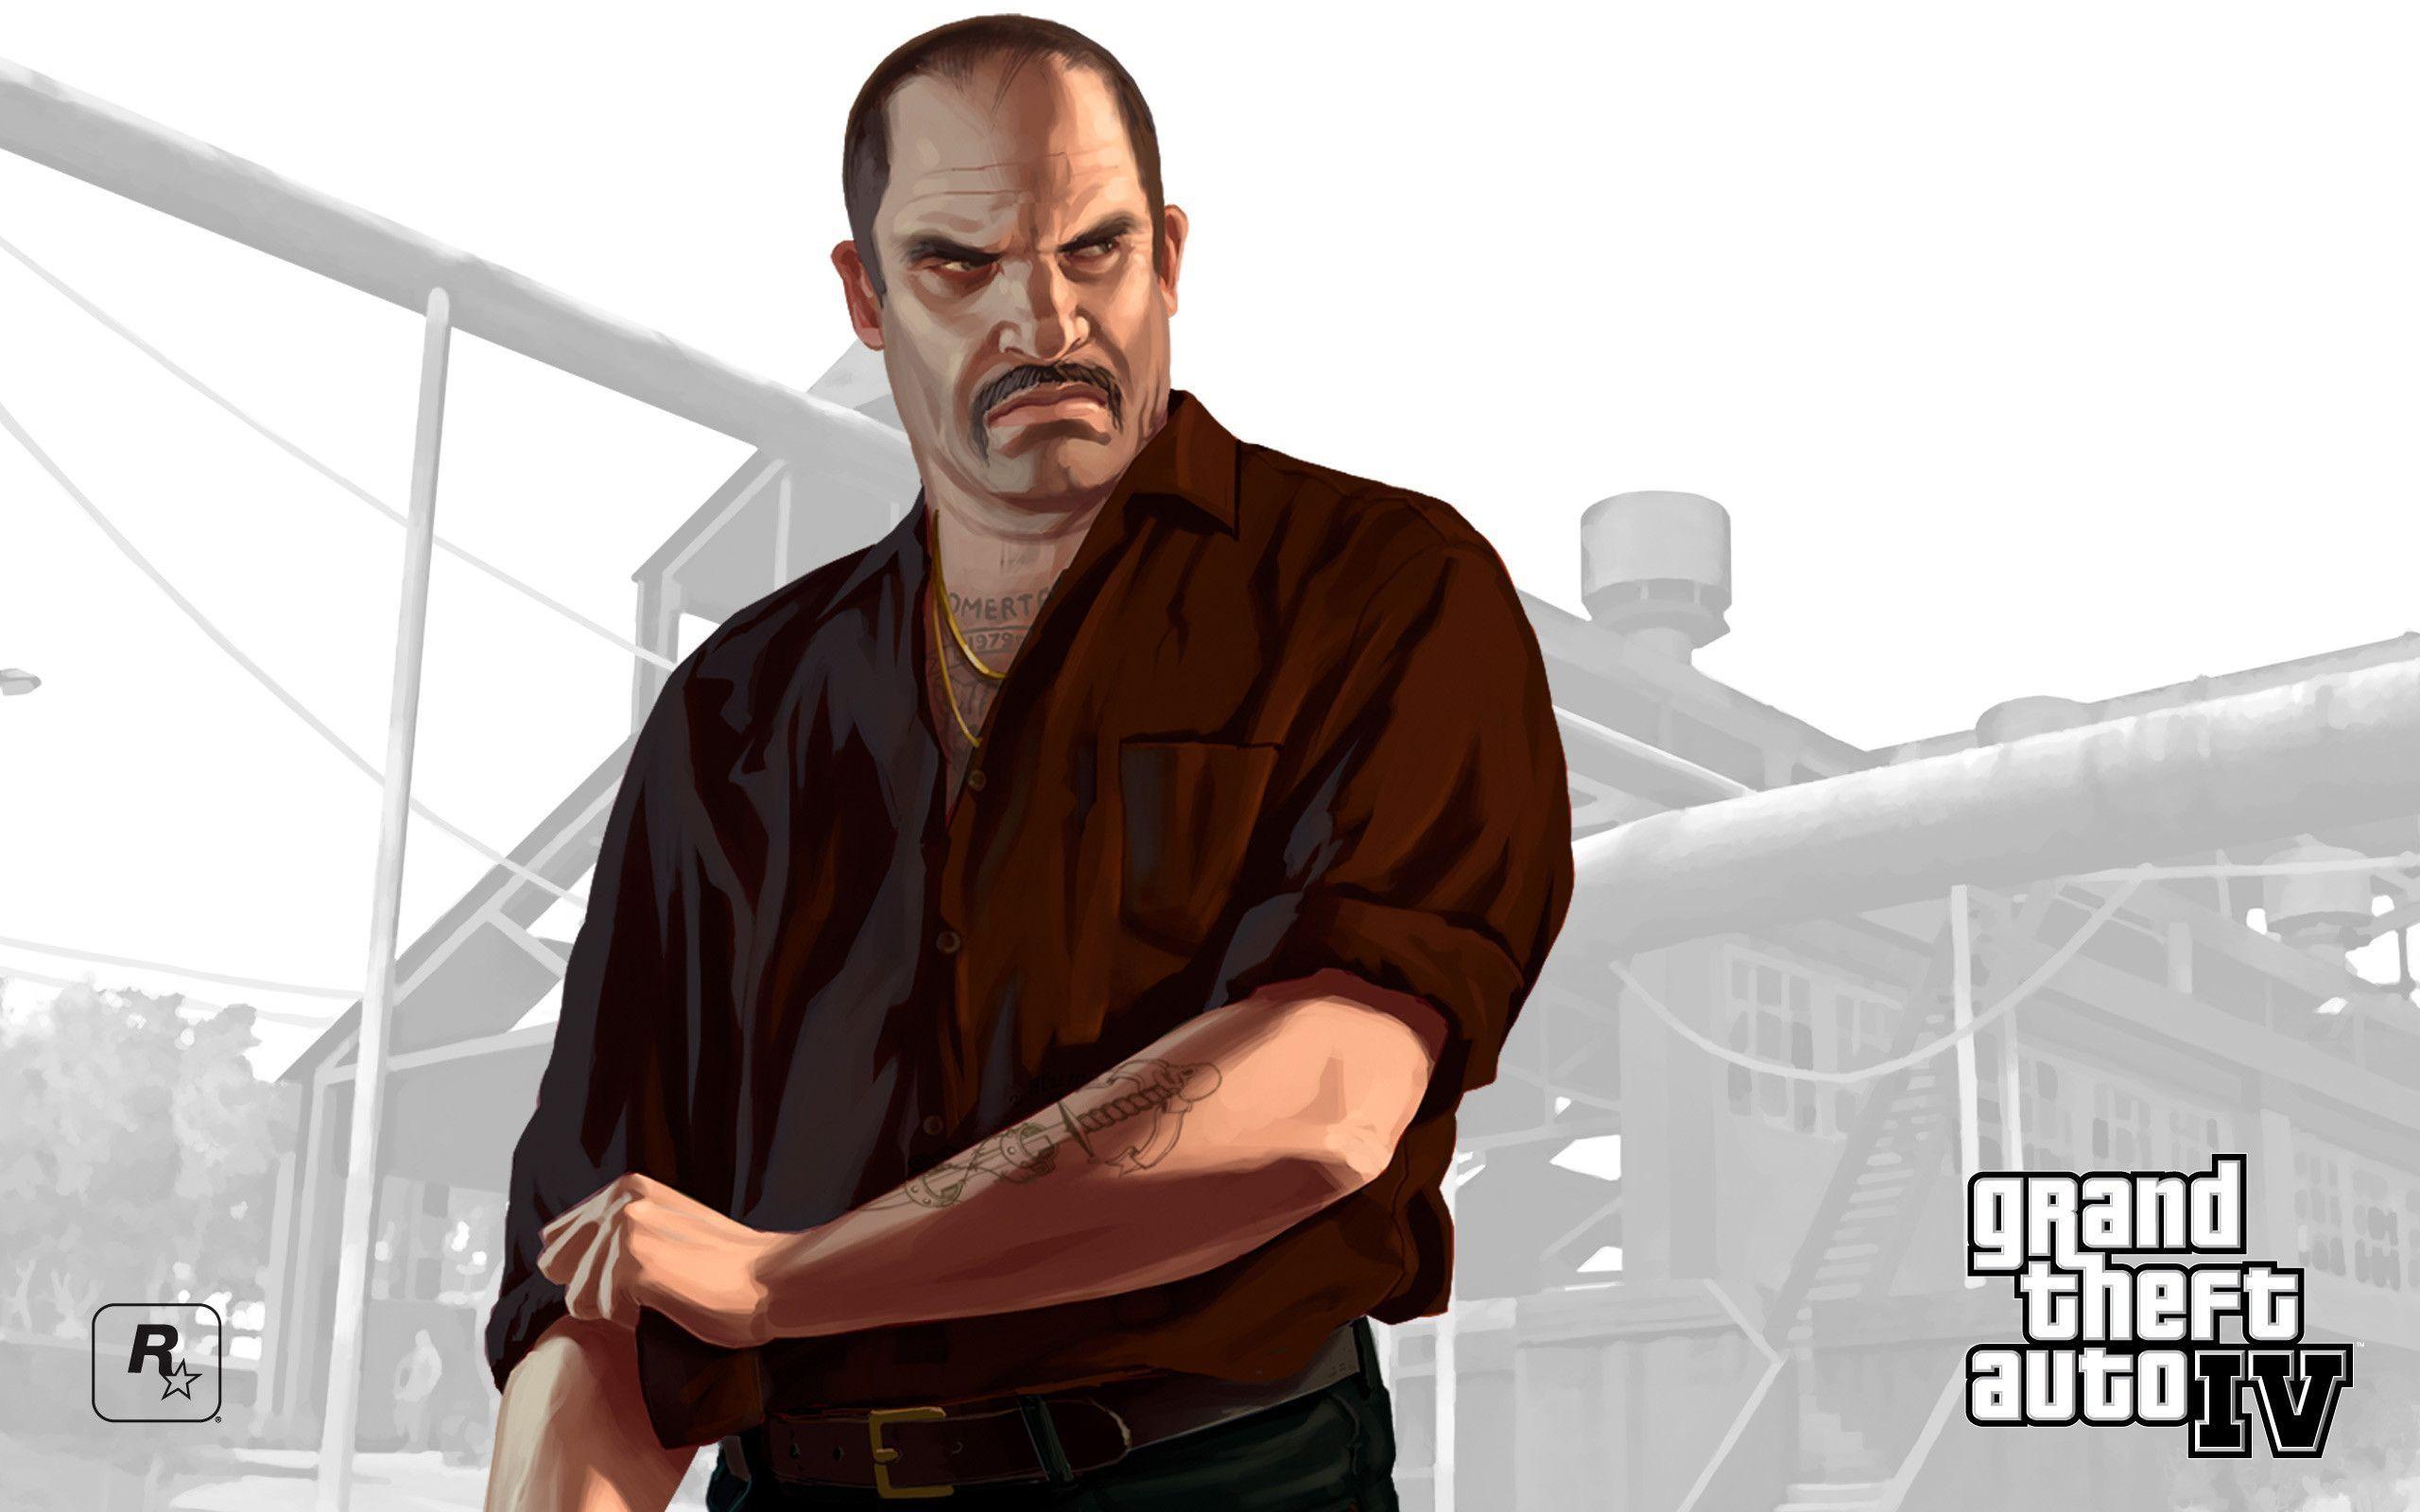 Res: 2560x1600, Wallpapers de GTA IV y diferentes expansiones [Megapost] - Taringa!